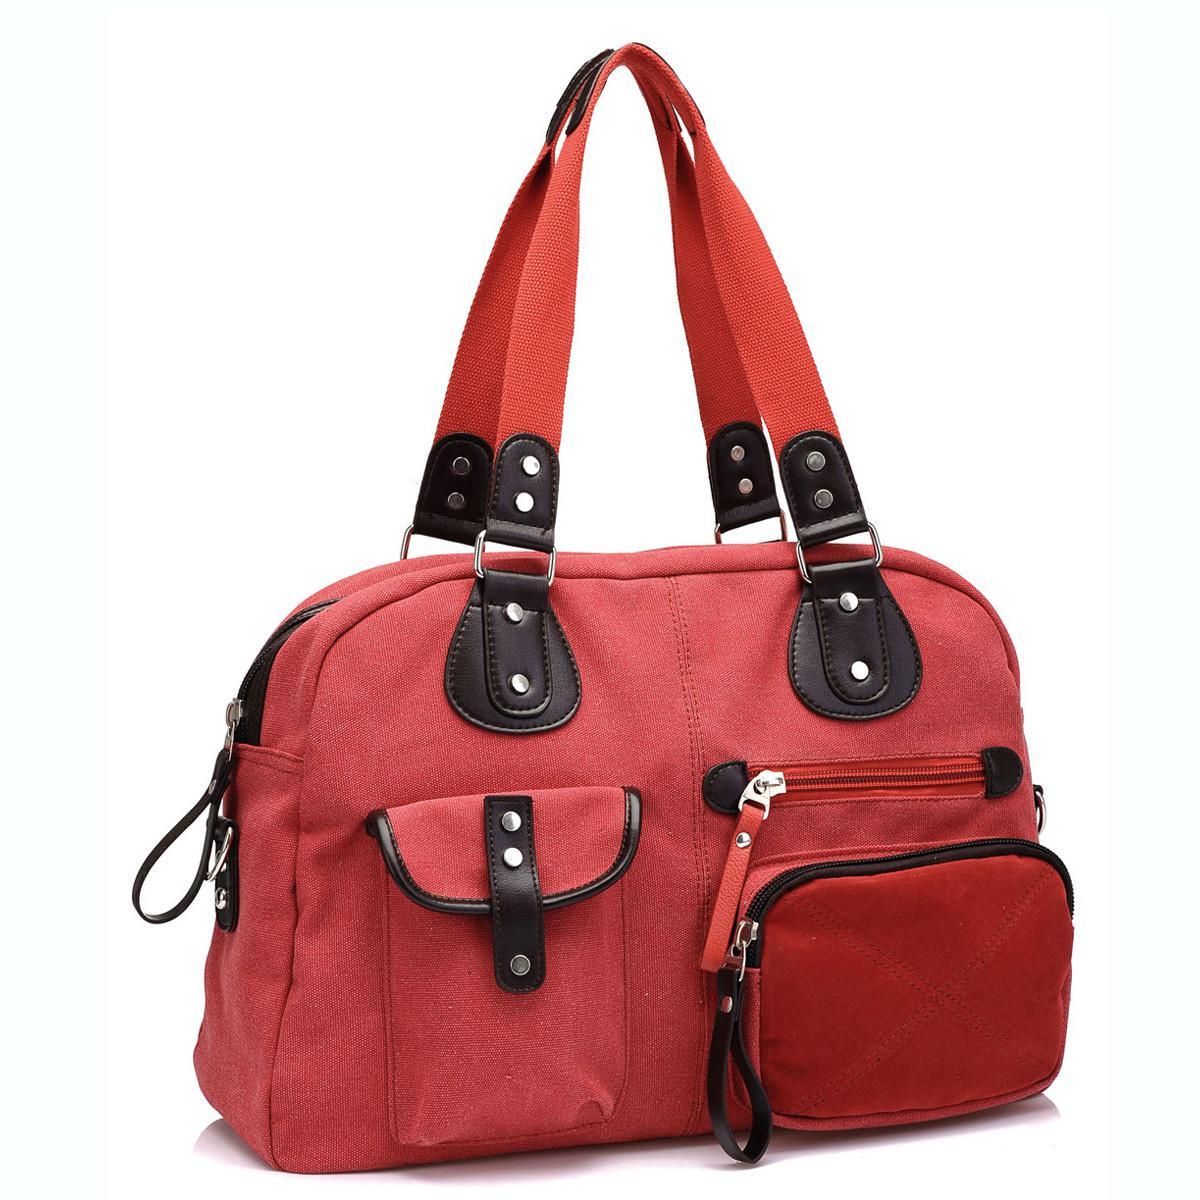 Bag large capacity travel bag canvas bag women s handbag big bags